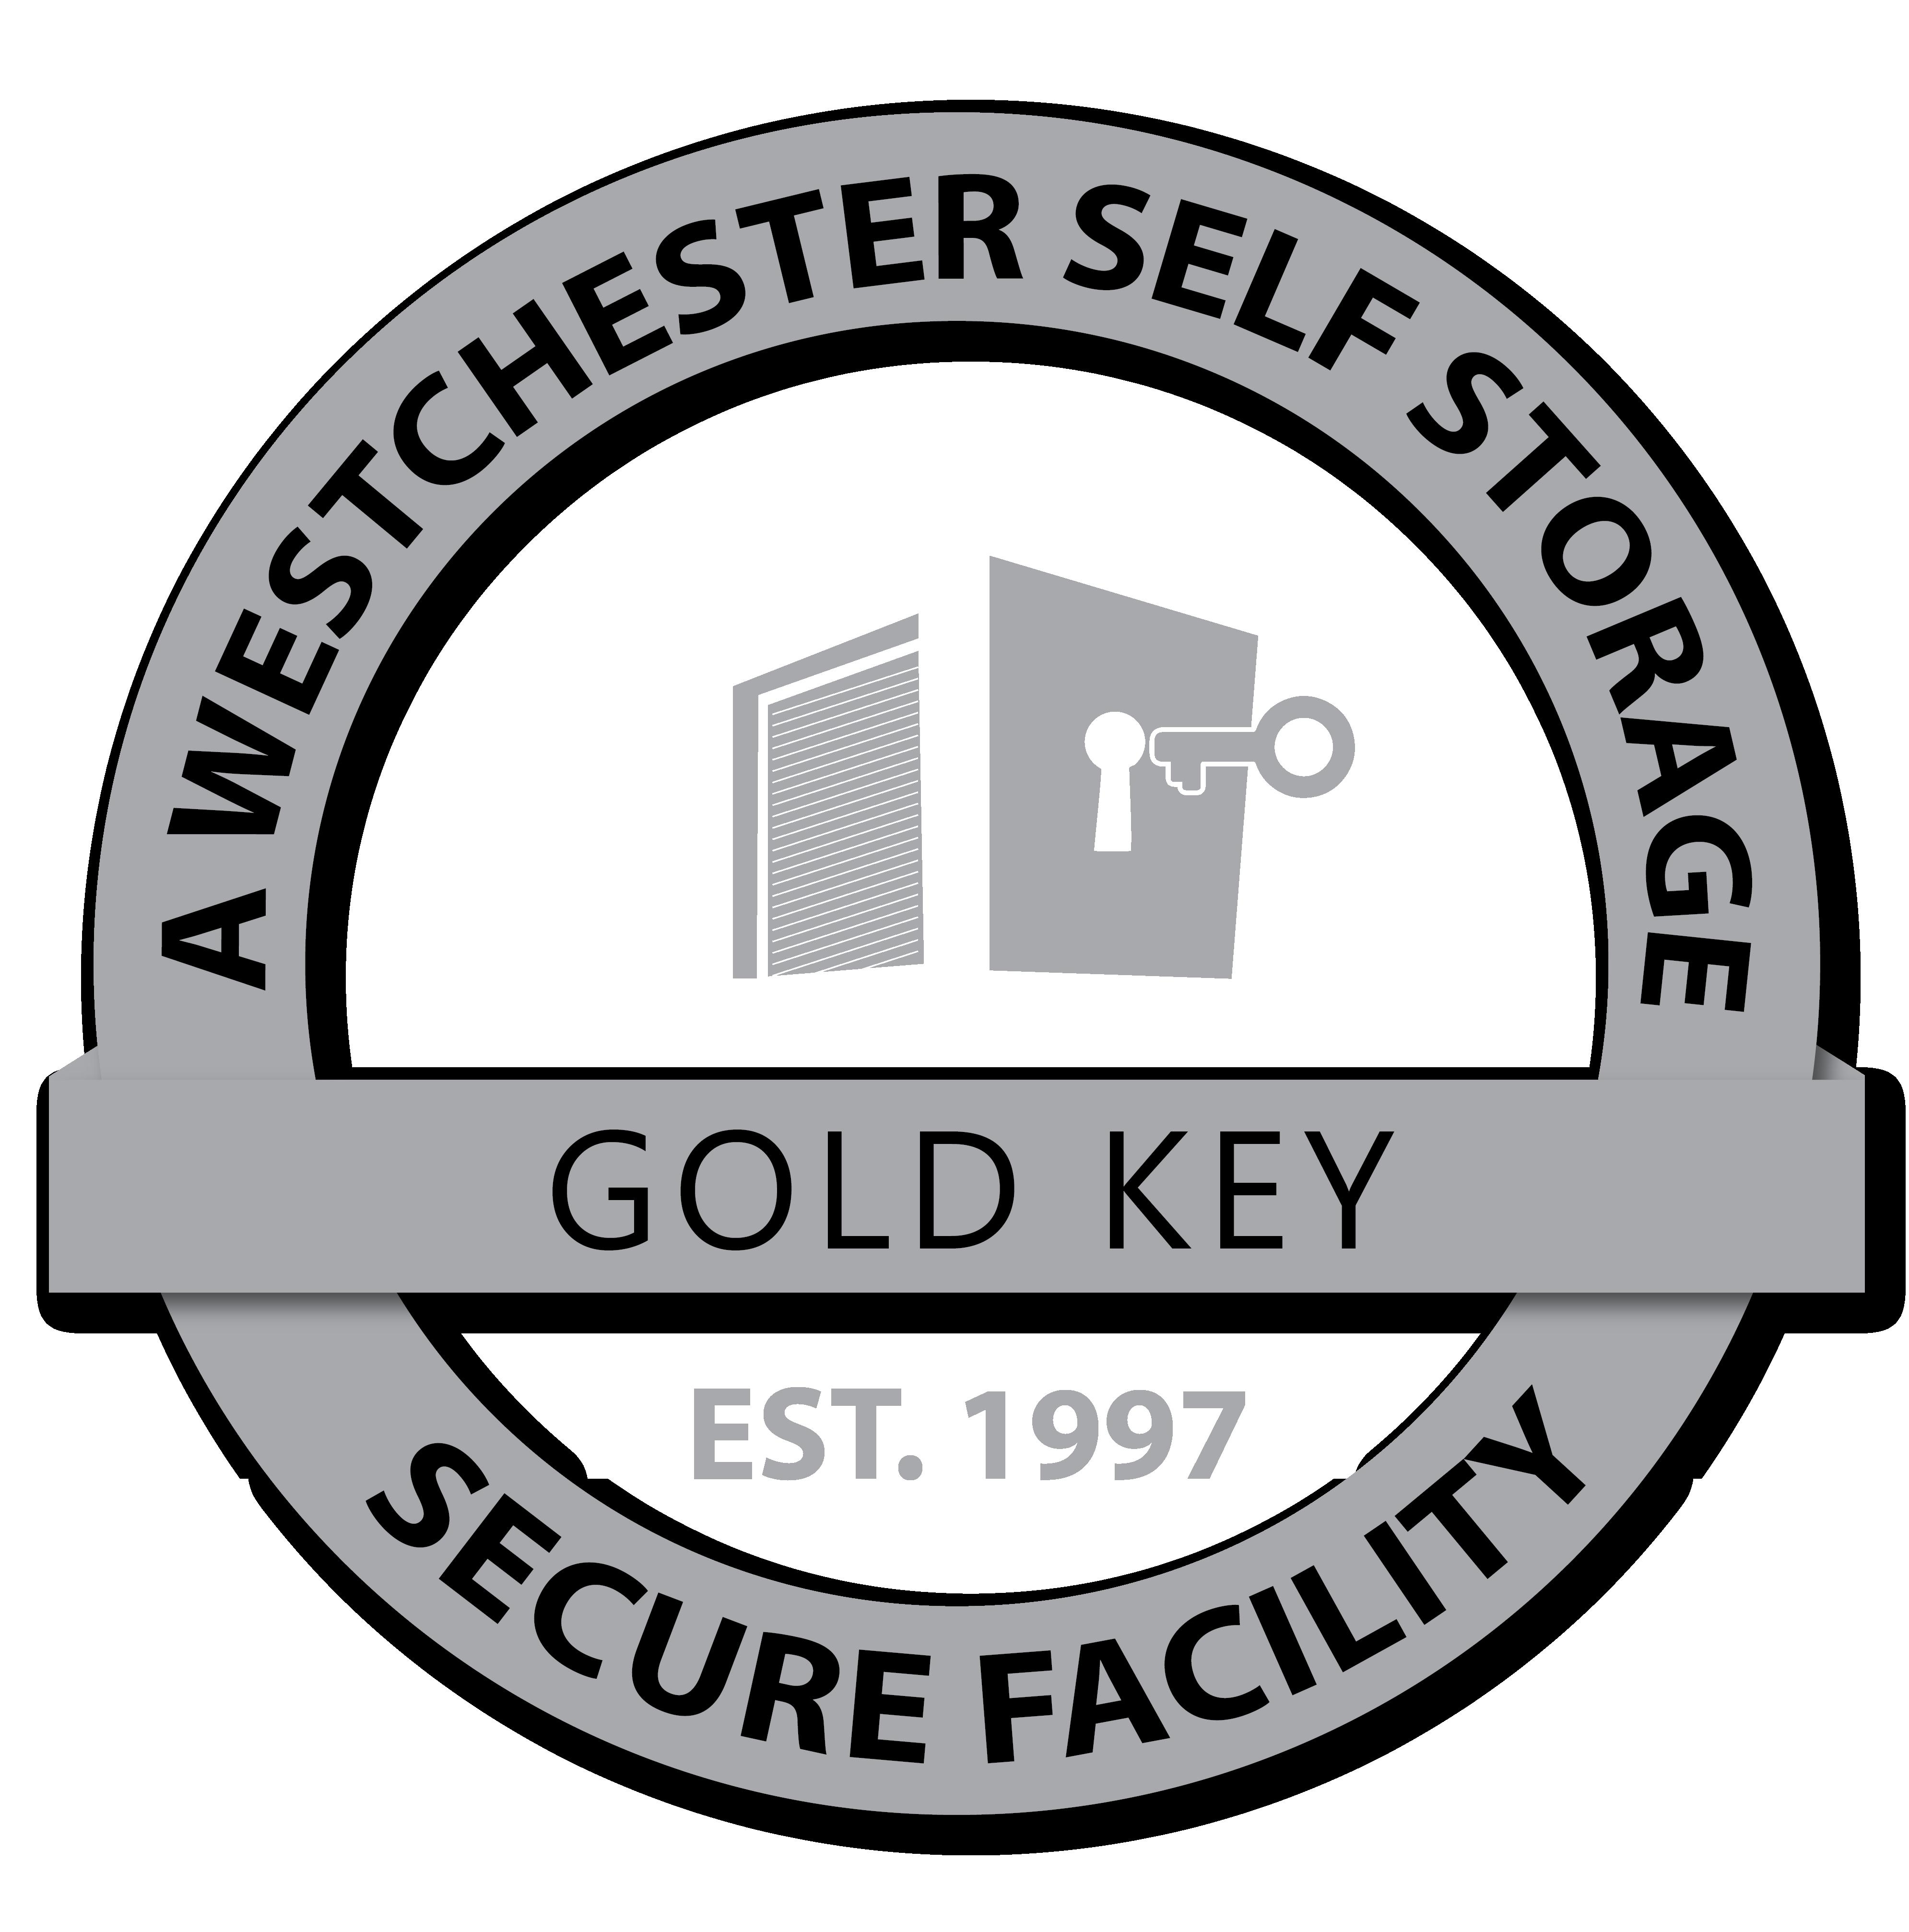 Westchester County NY Self Storage Locations logo